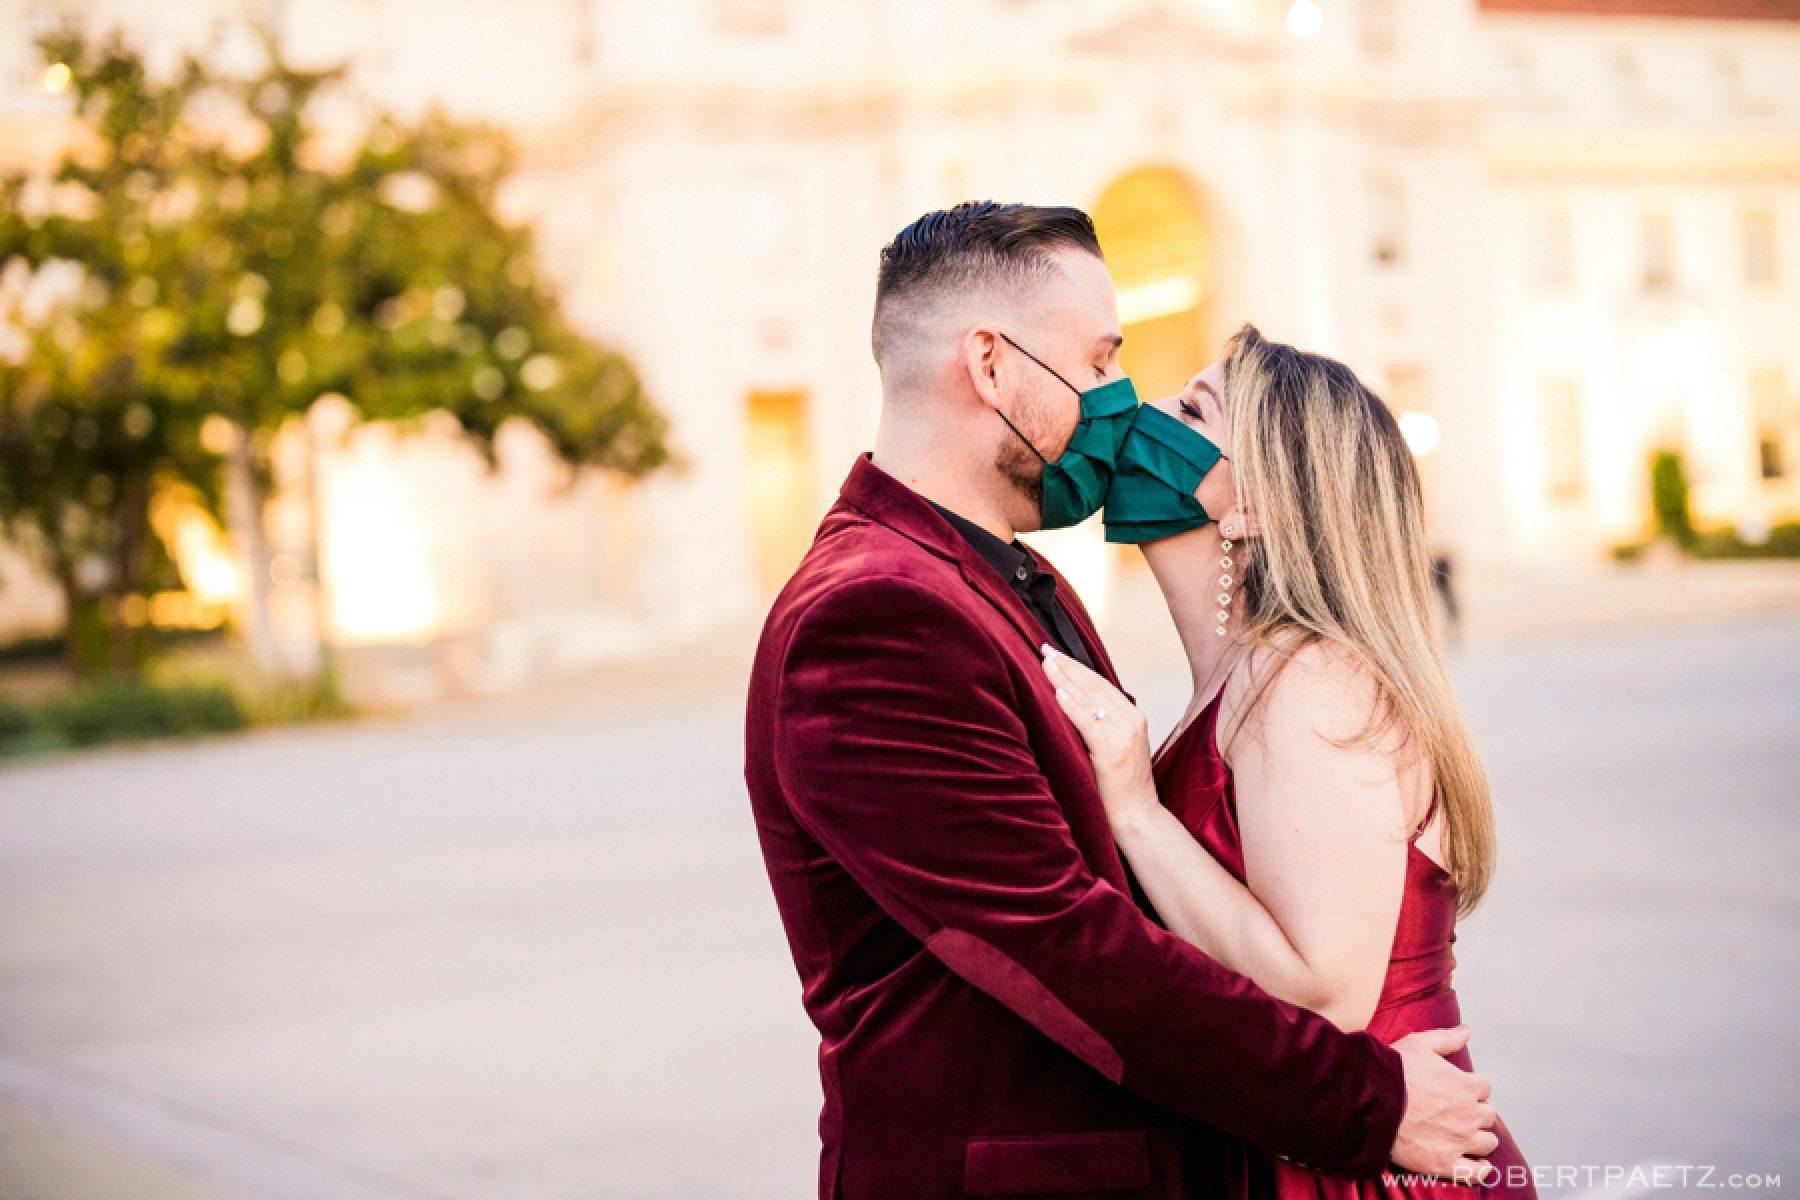 A Pasadena California engagement photography session at Pasadena City Hall, photographed by the west coast destination wedding photographer, Robert Paetz.